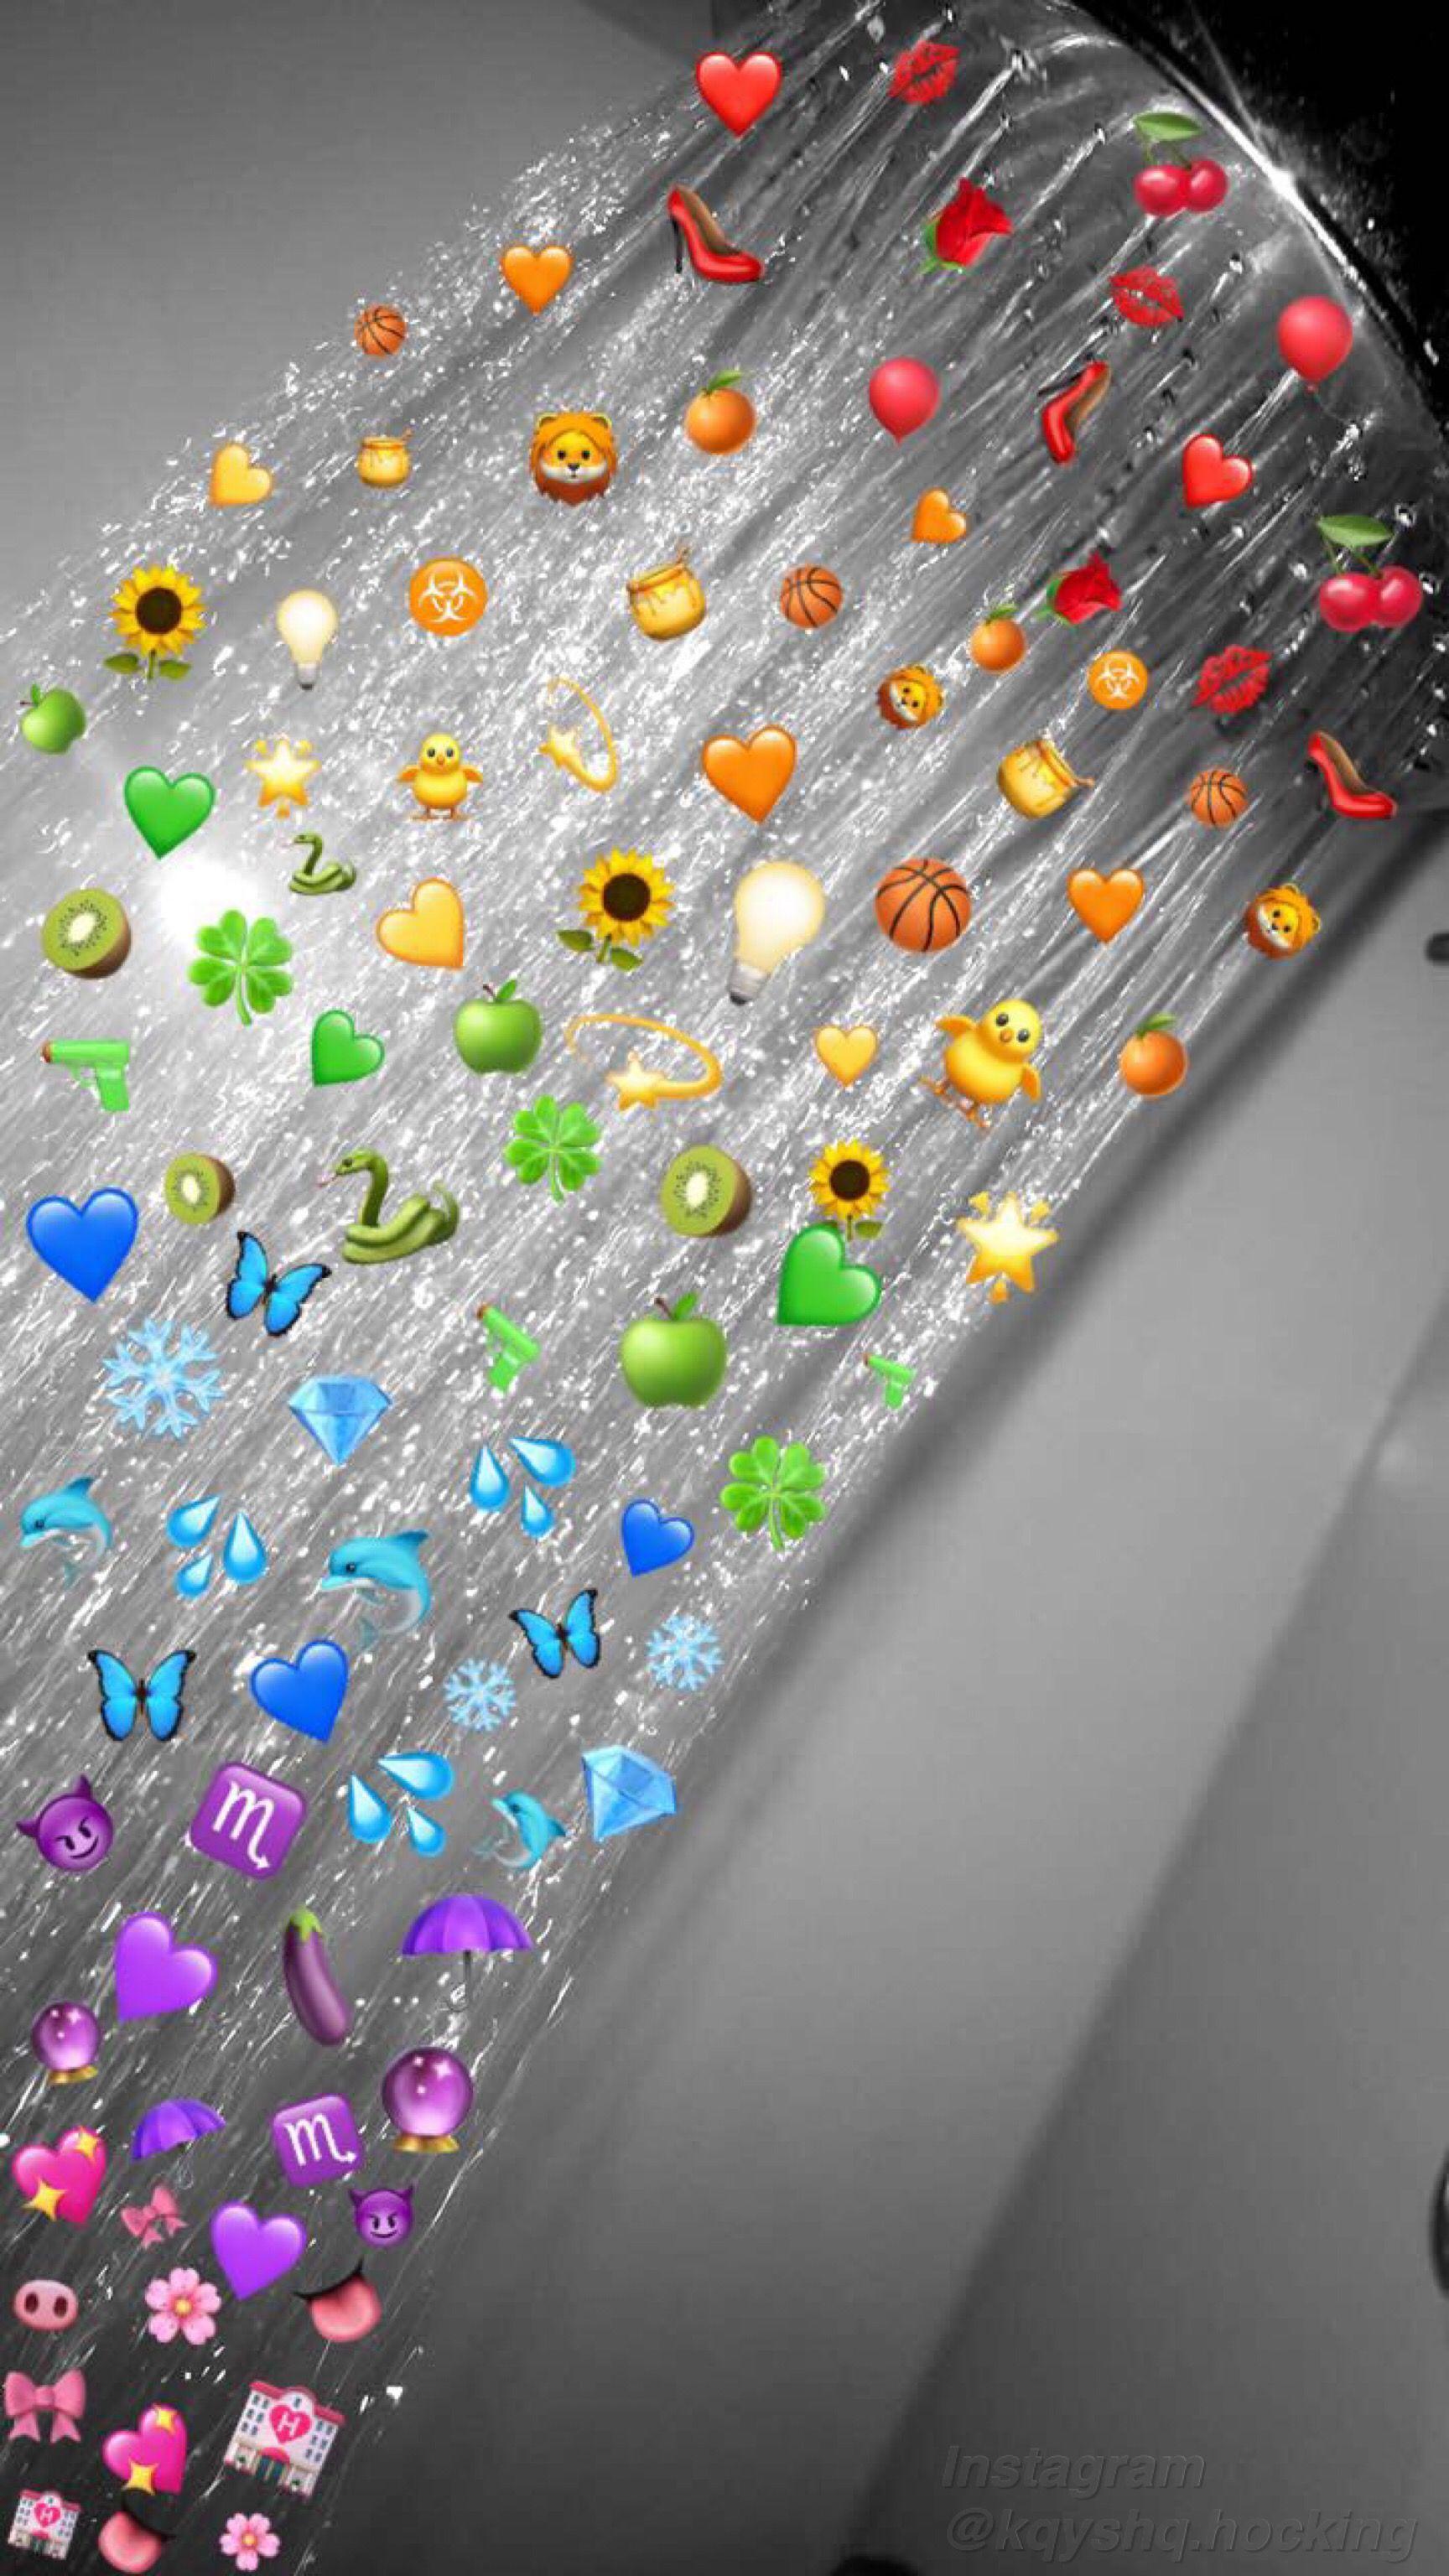 Aesthetic Rainbow Emoji Shower Wallpaper Aesthetic Iphone Wallpaper Emoji Wallpaper Iphone Wallpaper Images